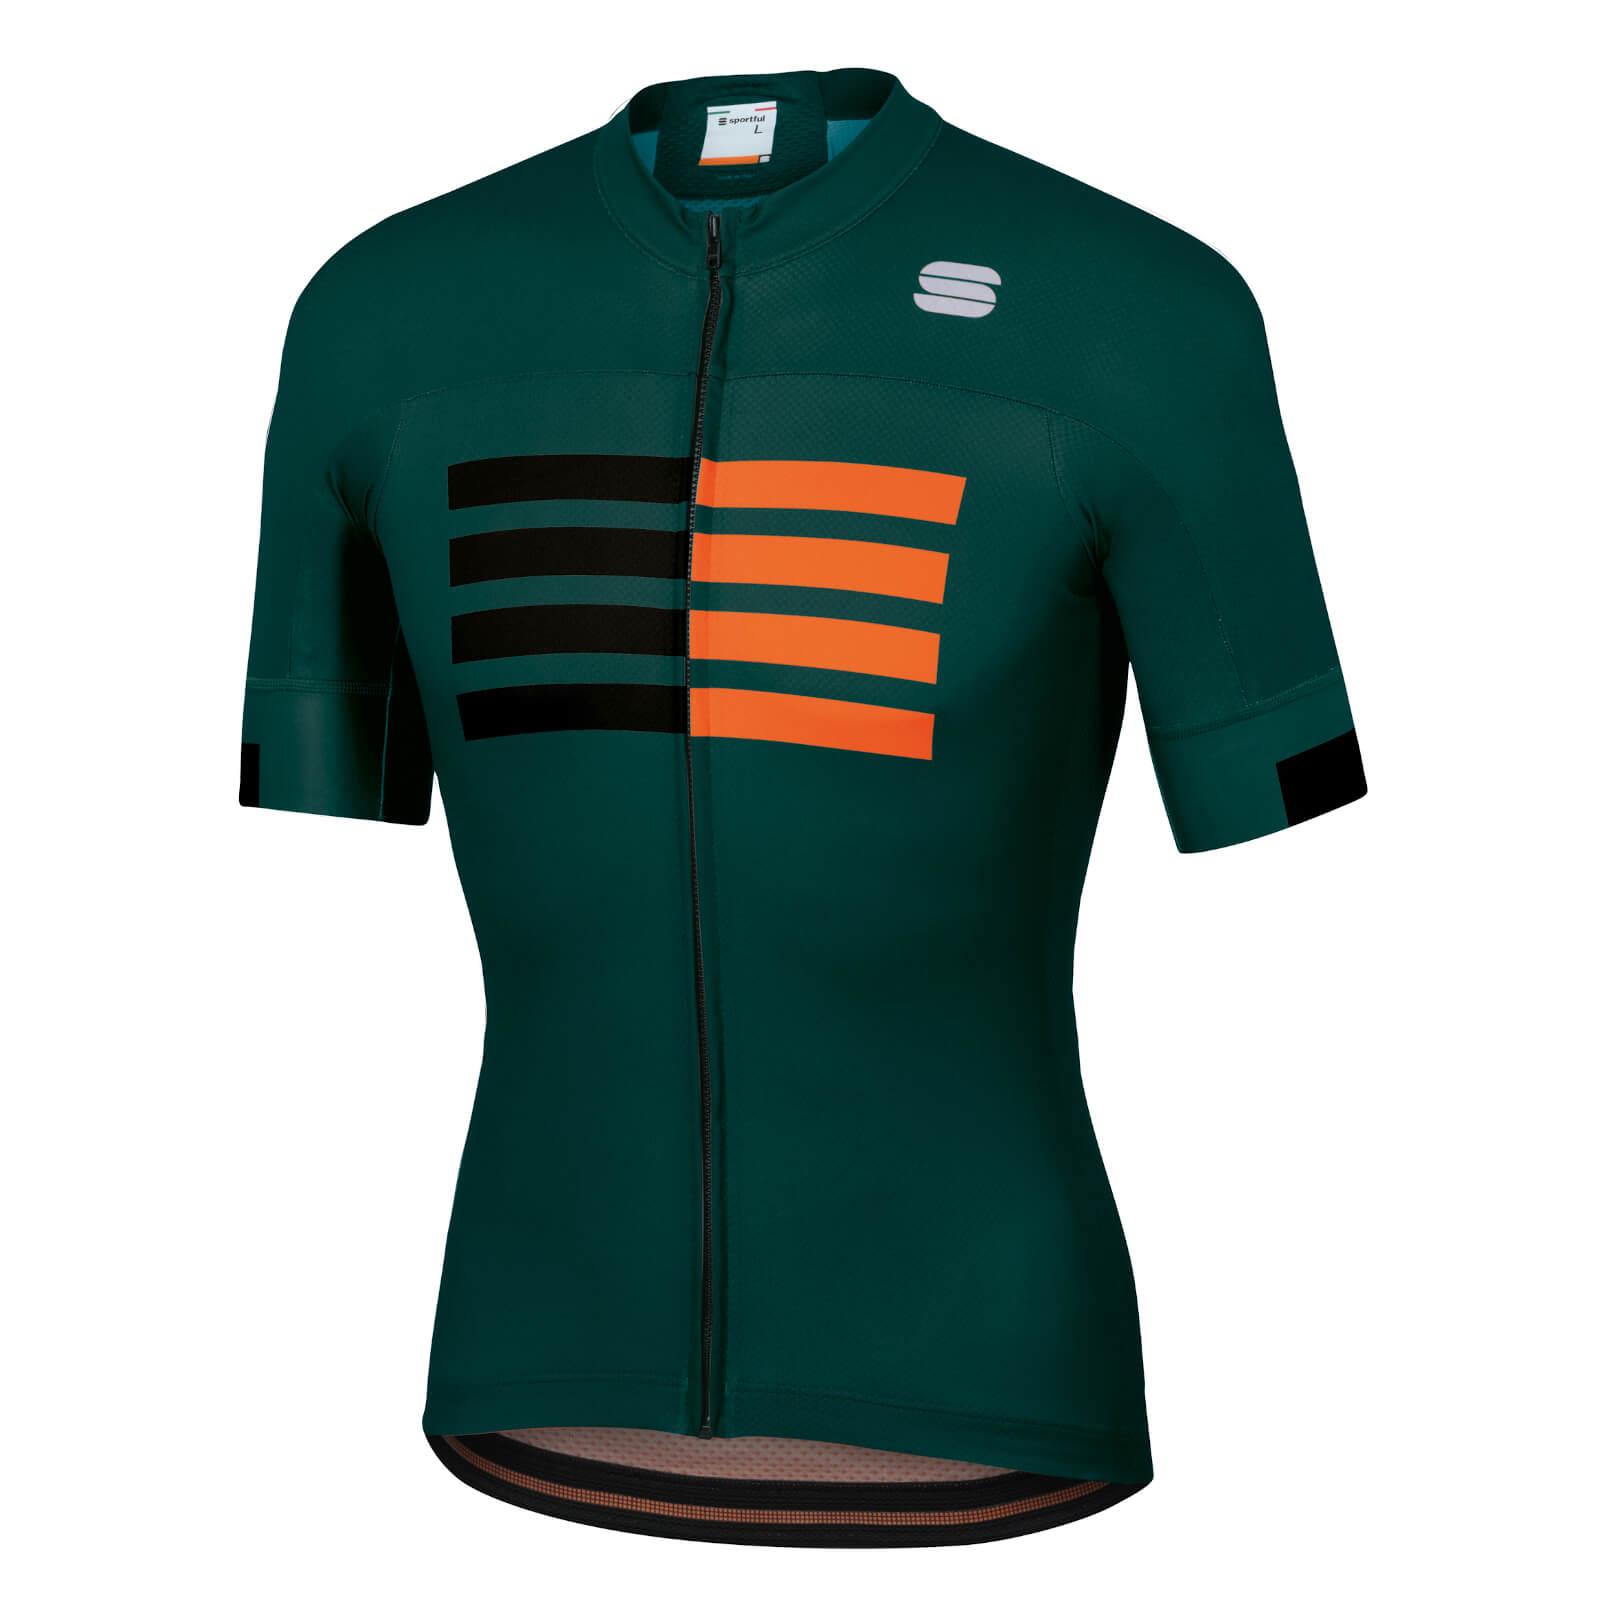 Sportful Wire Jersey - M - Sea Moss/Black/Orange SDR